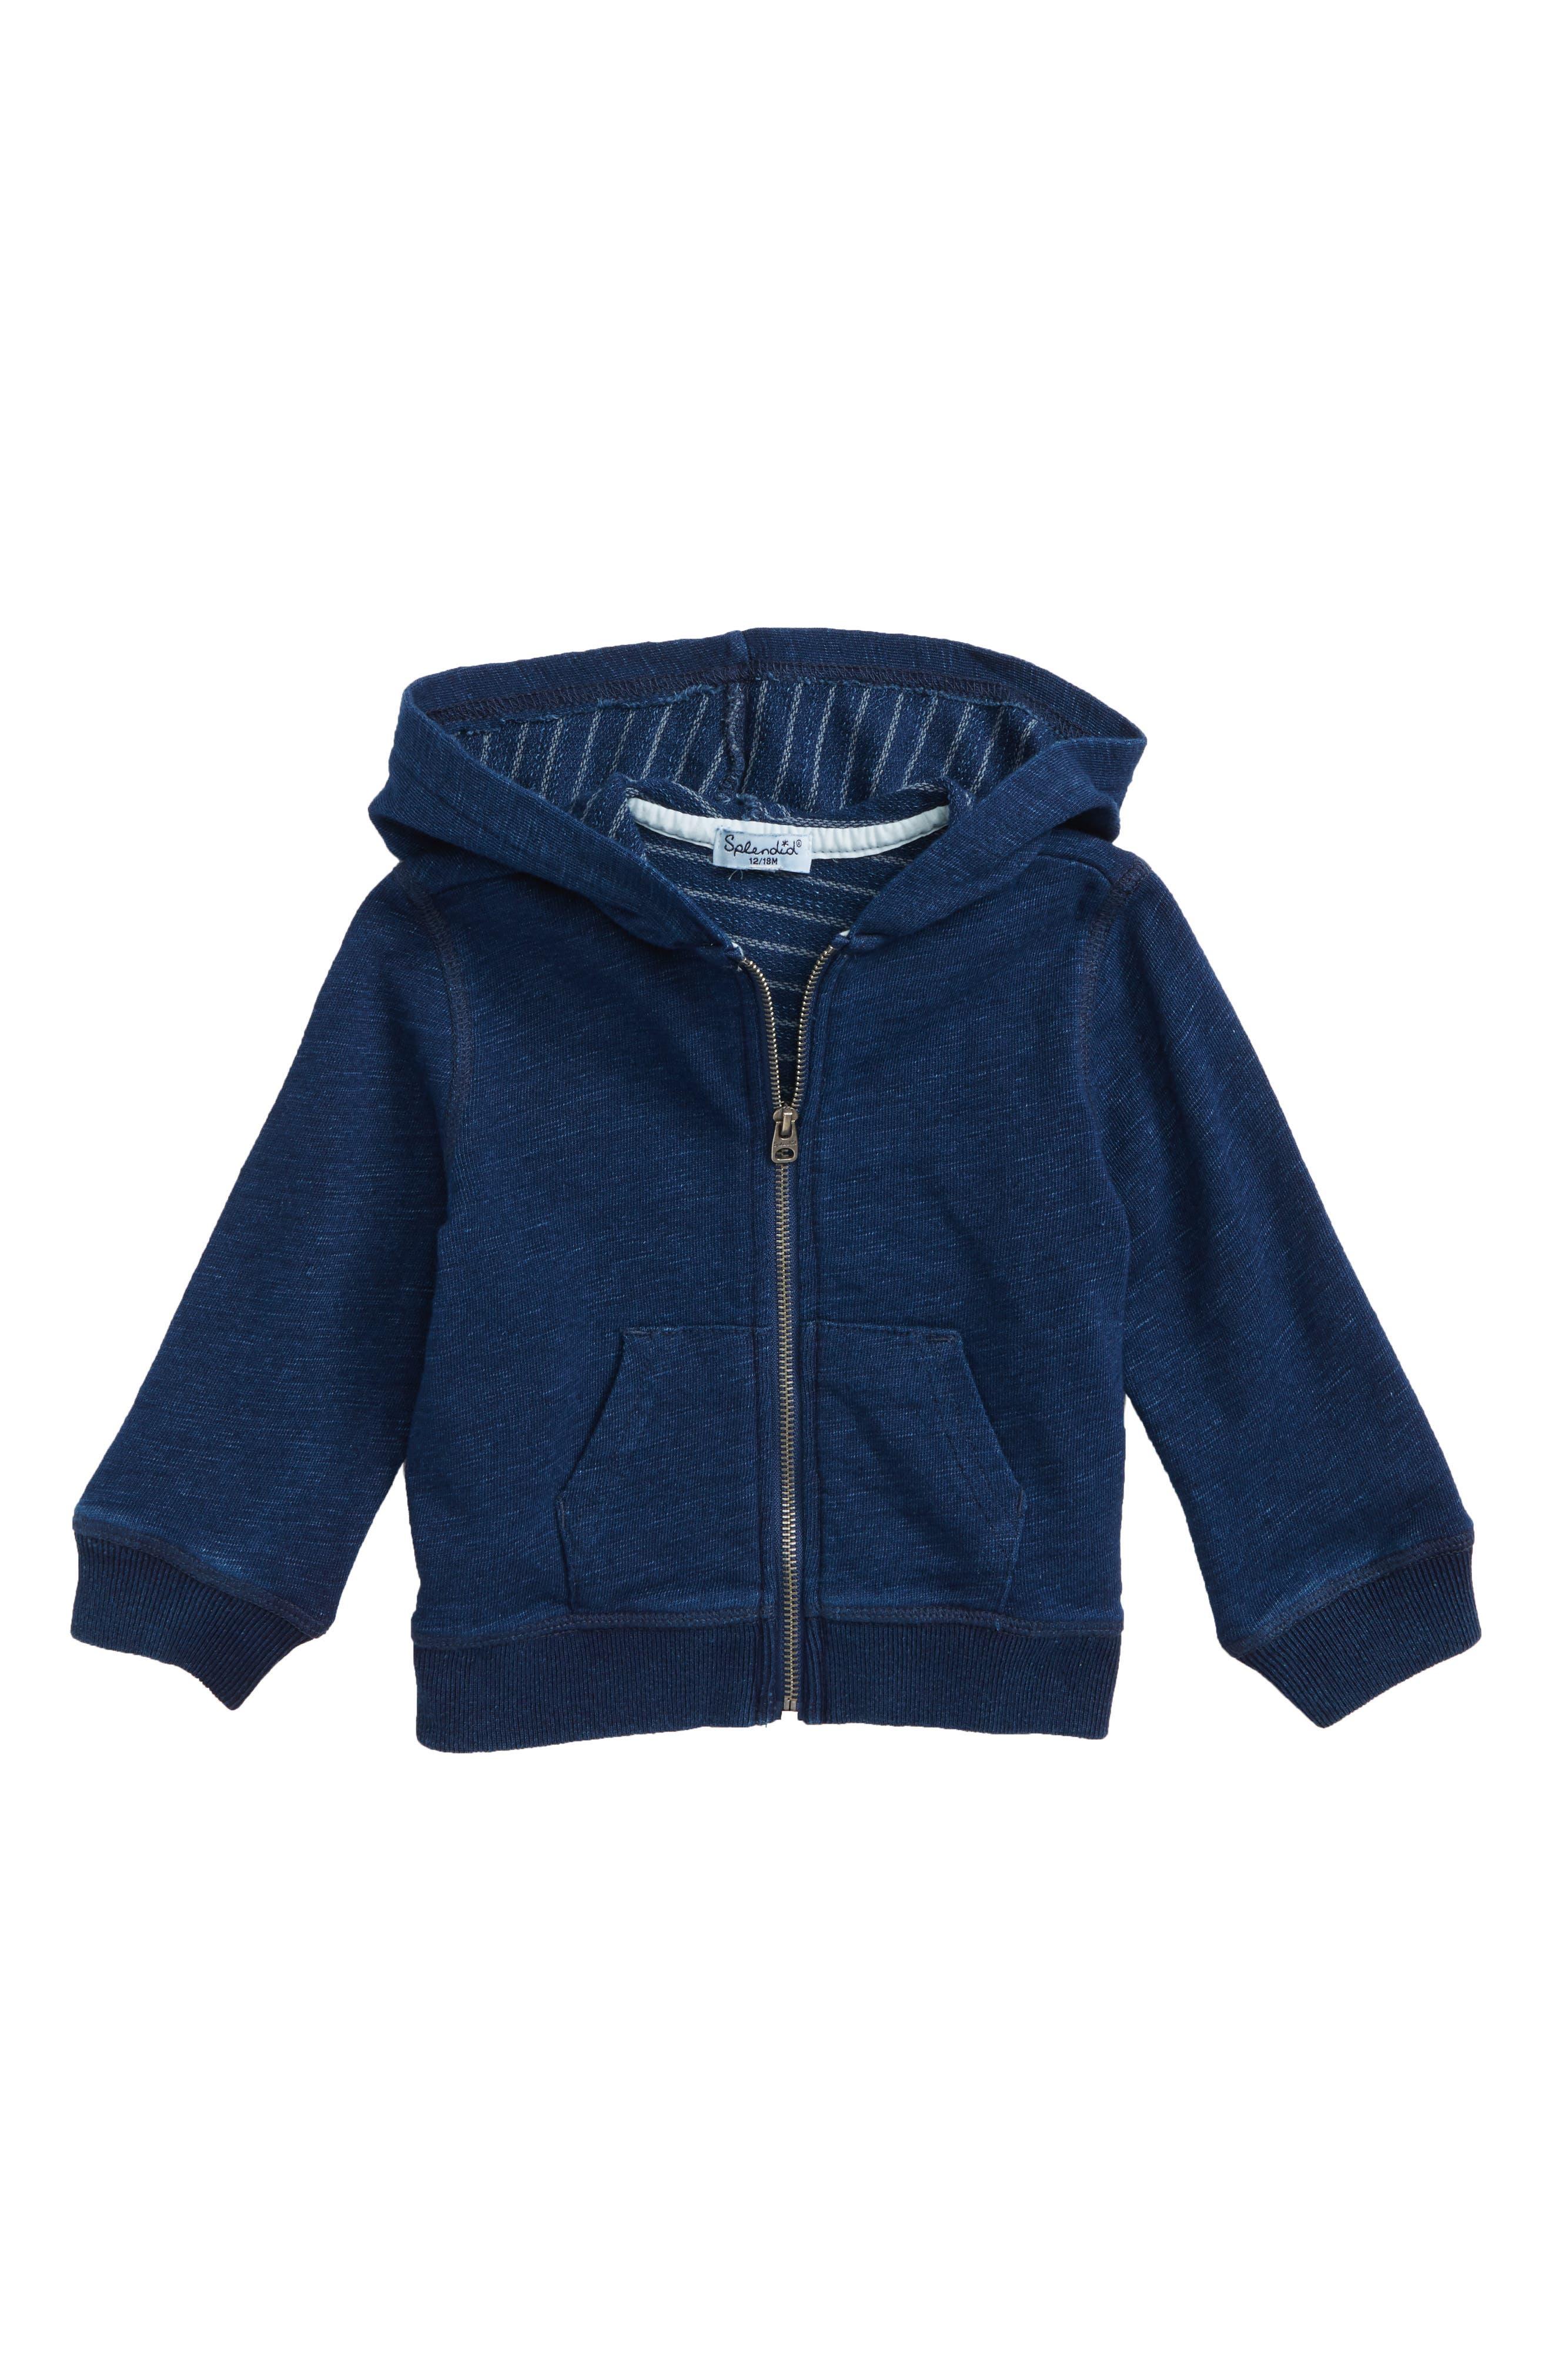 Double Knit Zip Hoodie,                         Main,                         color, Dark Stone/ Indigo